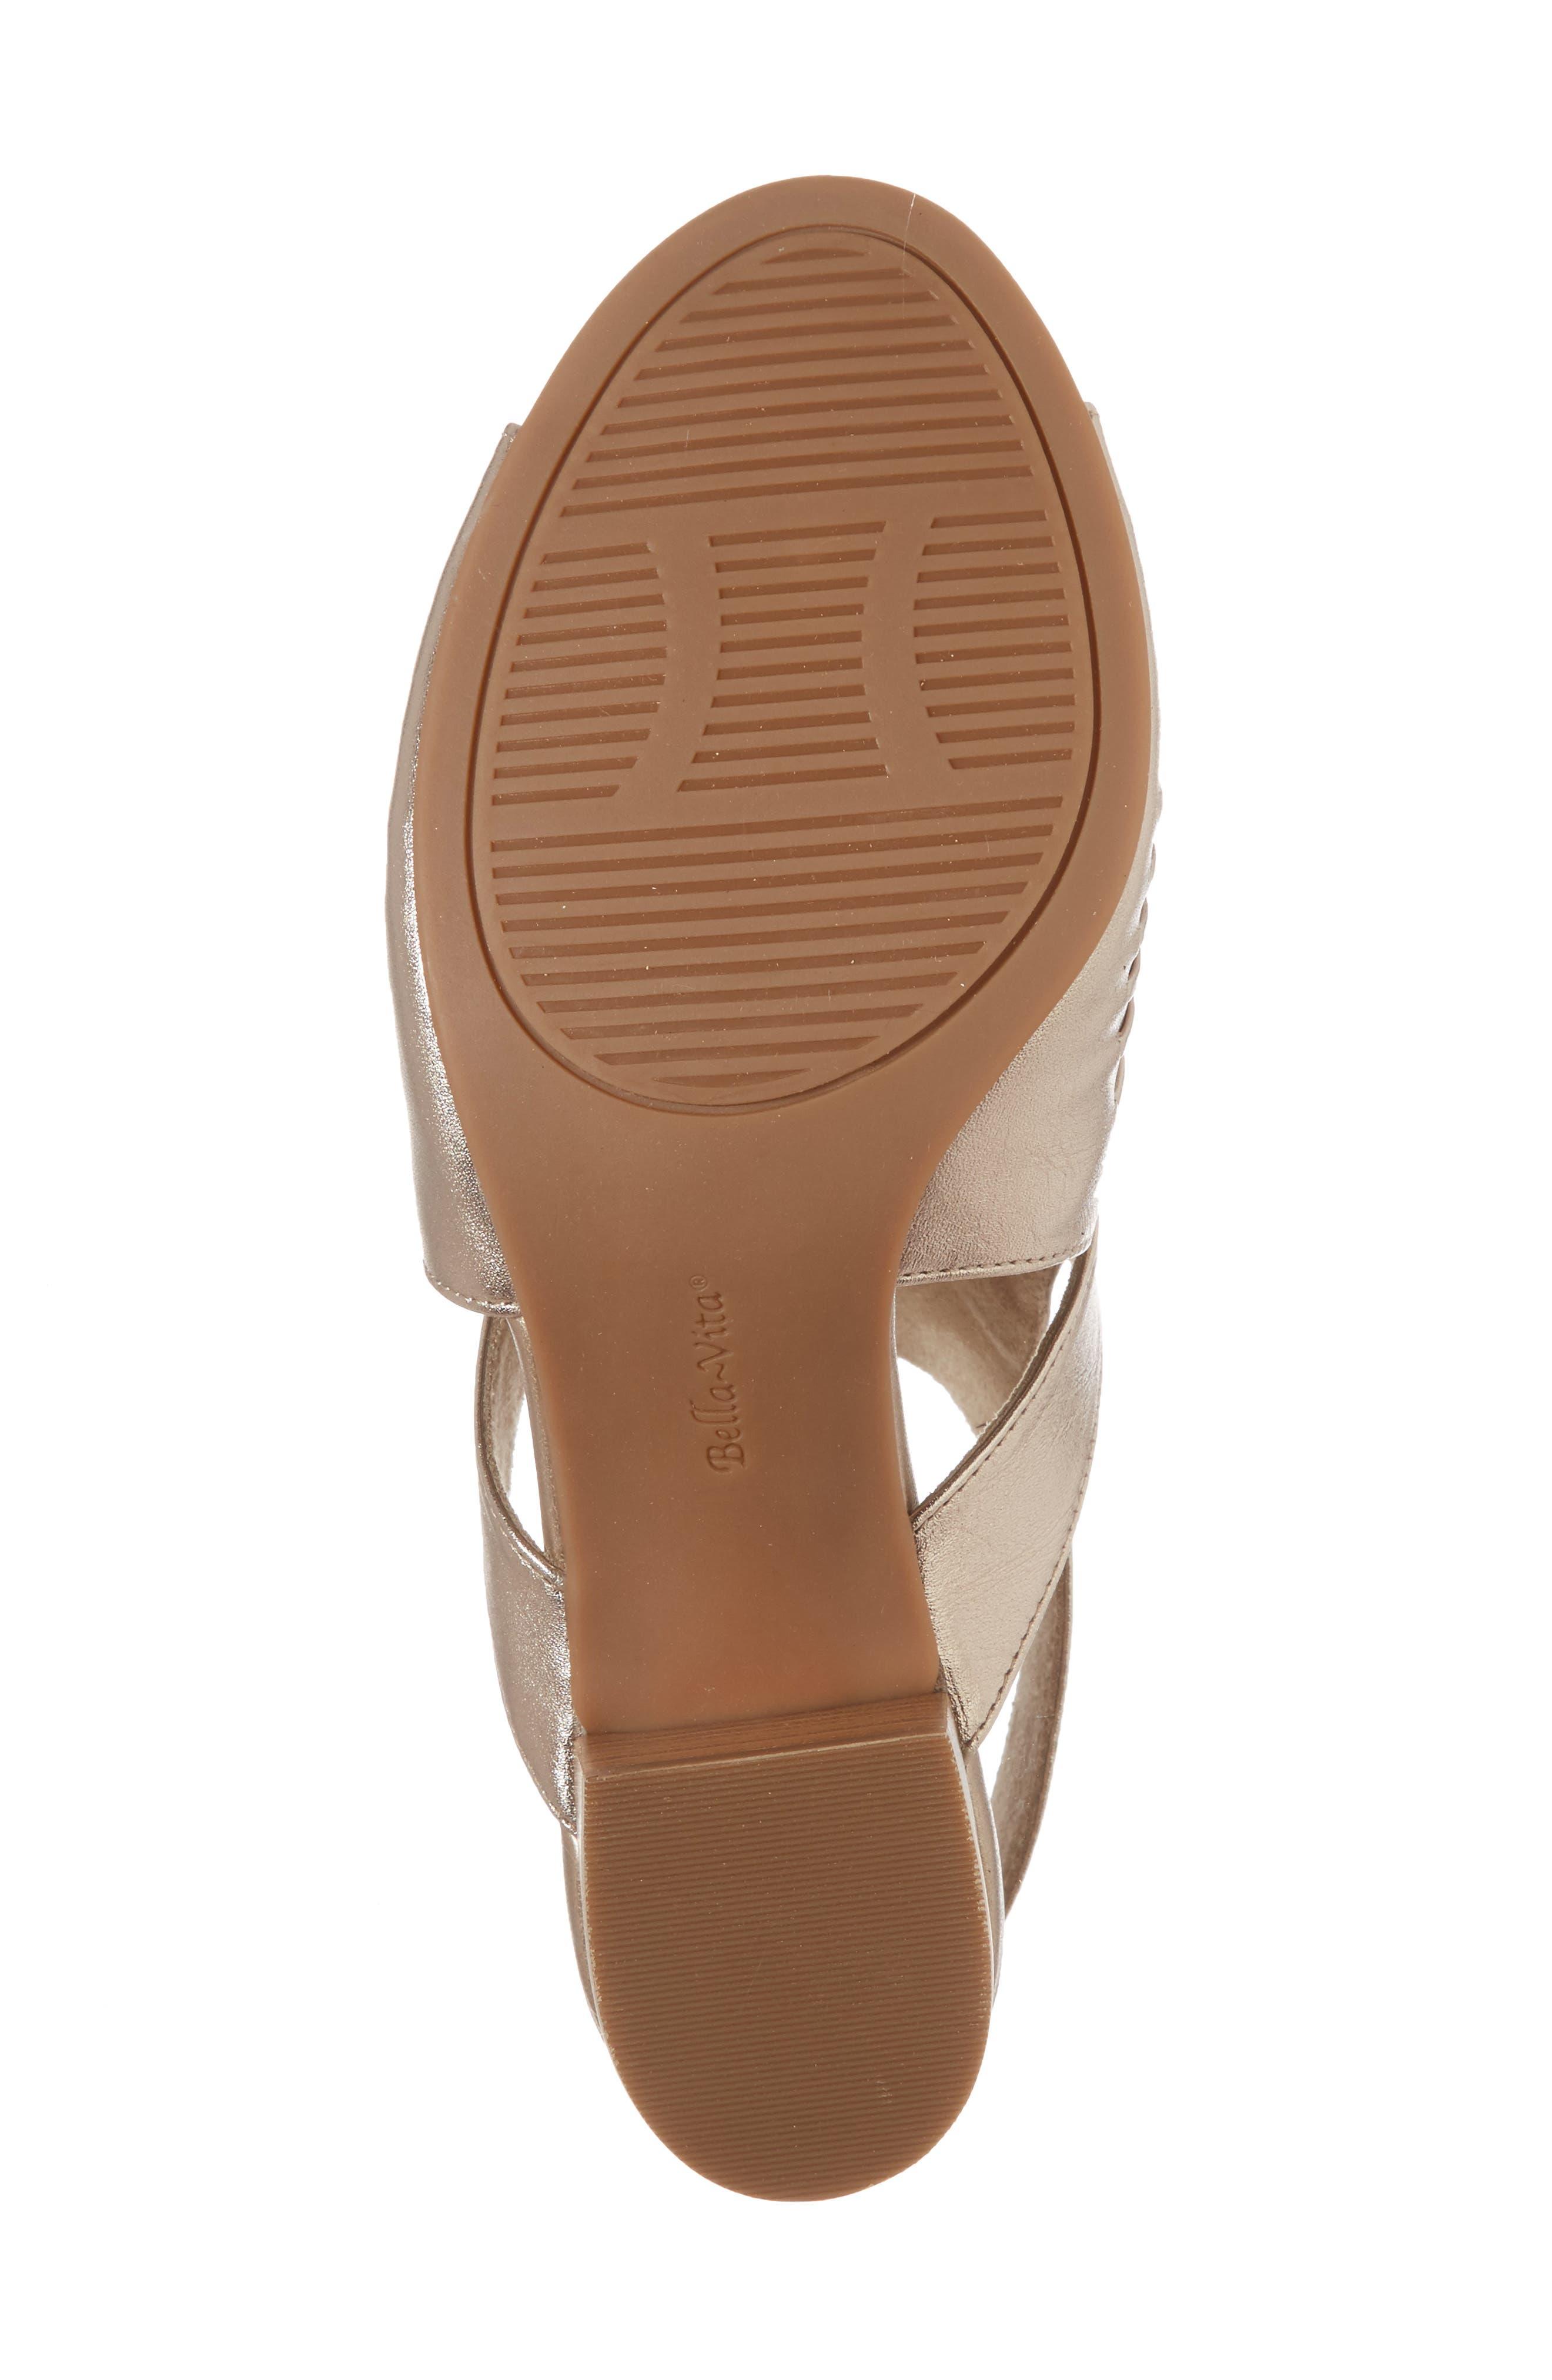 Finley Ankle Strap Sandal,                             Alternate thumbnail 28, color,